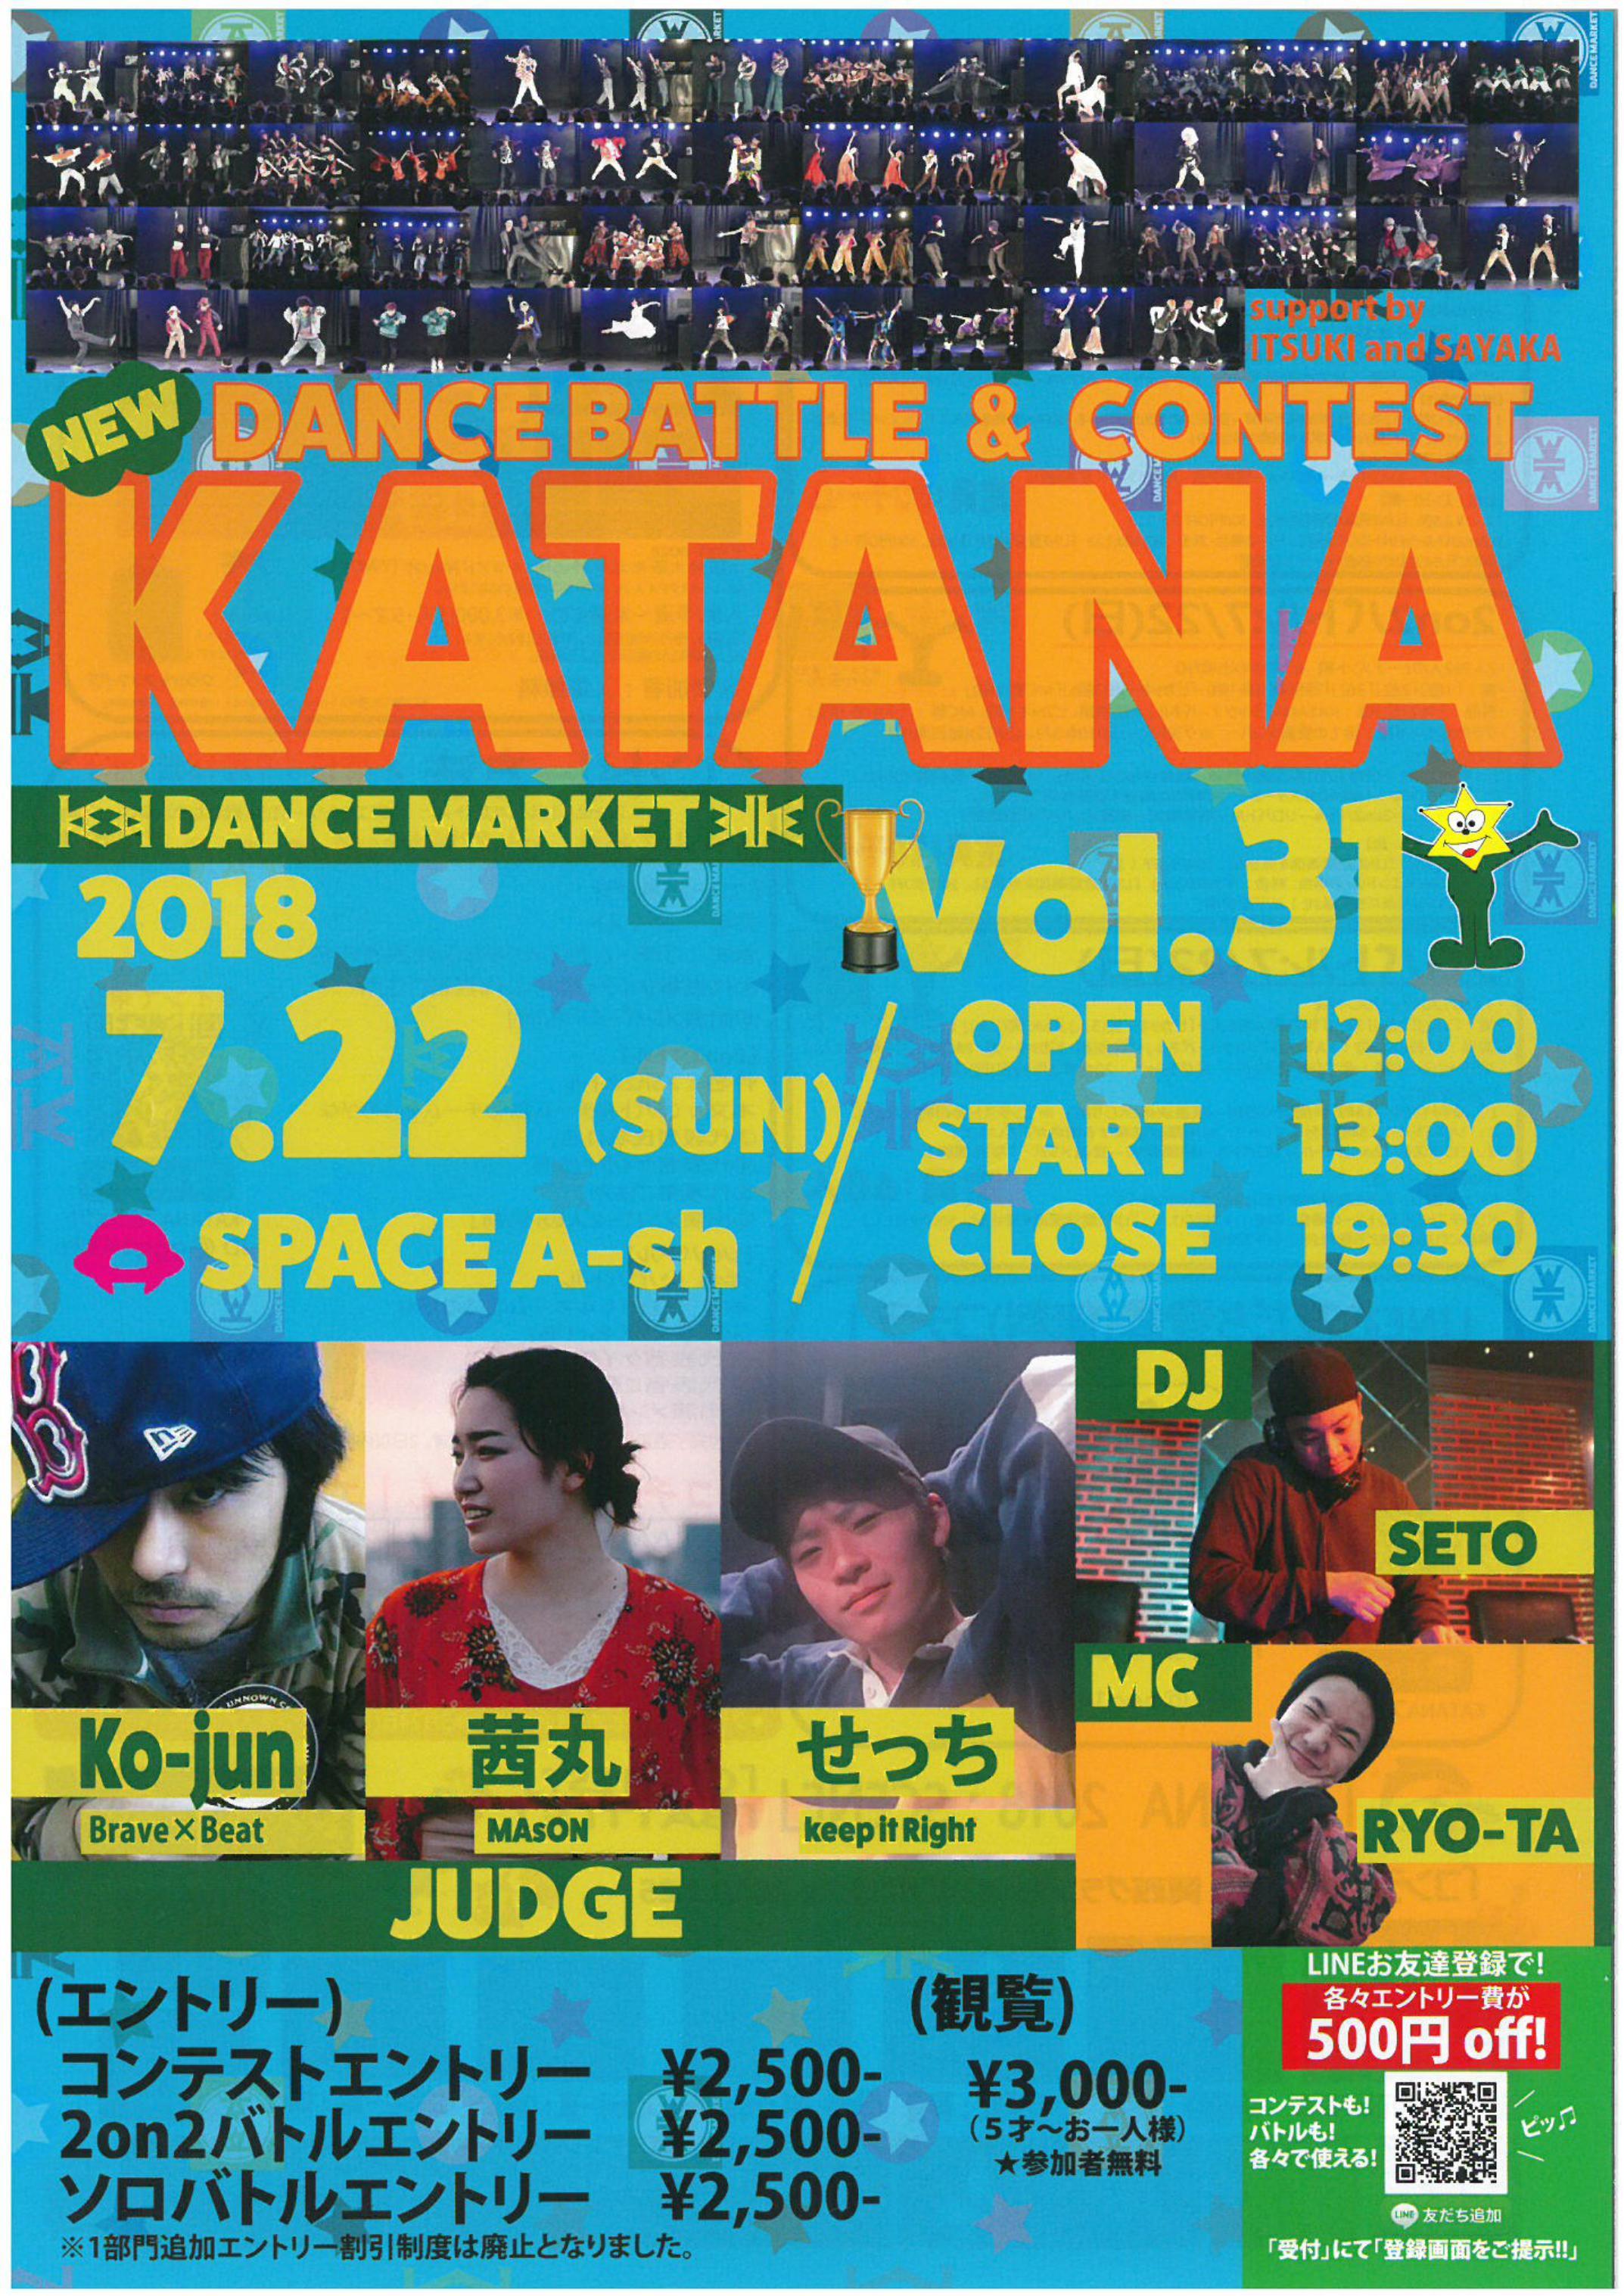 KATANA DANCE MARKET VOL.31